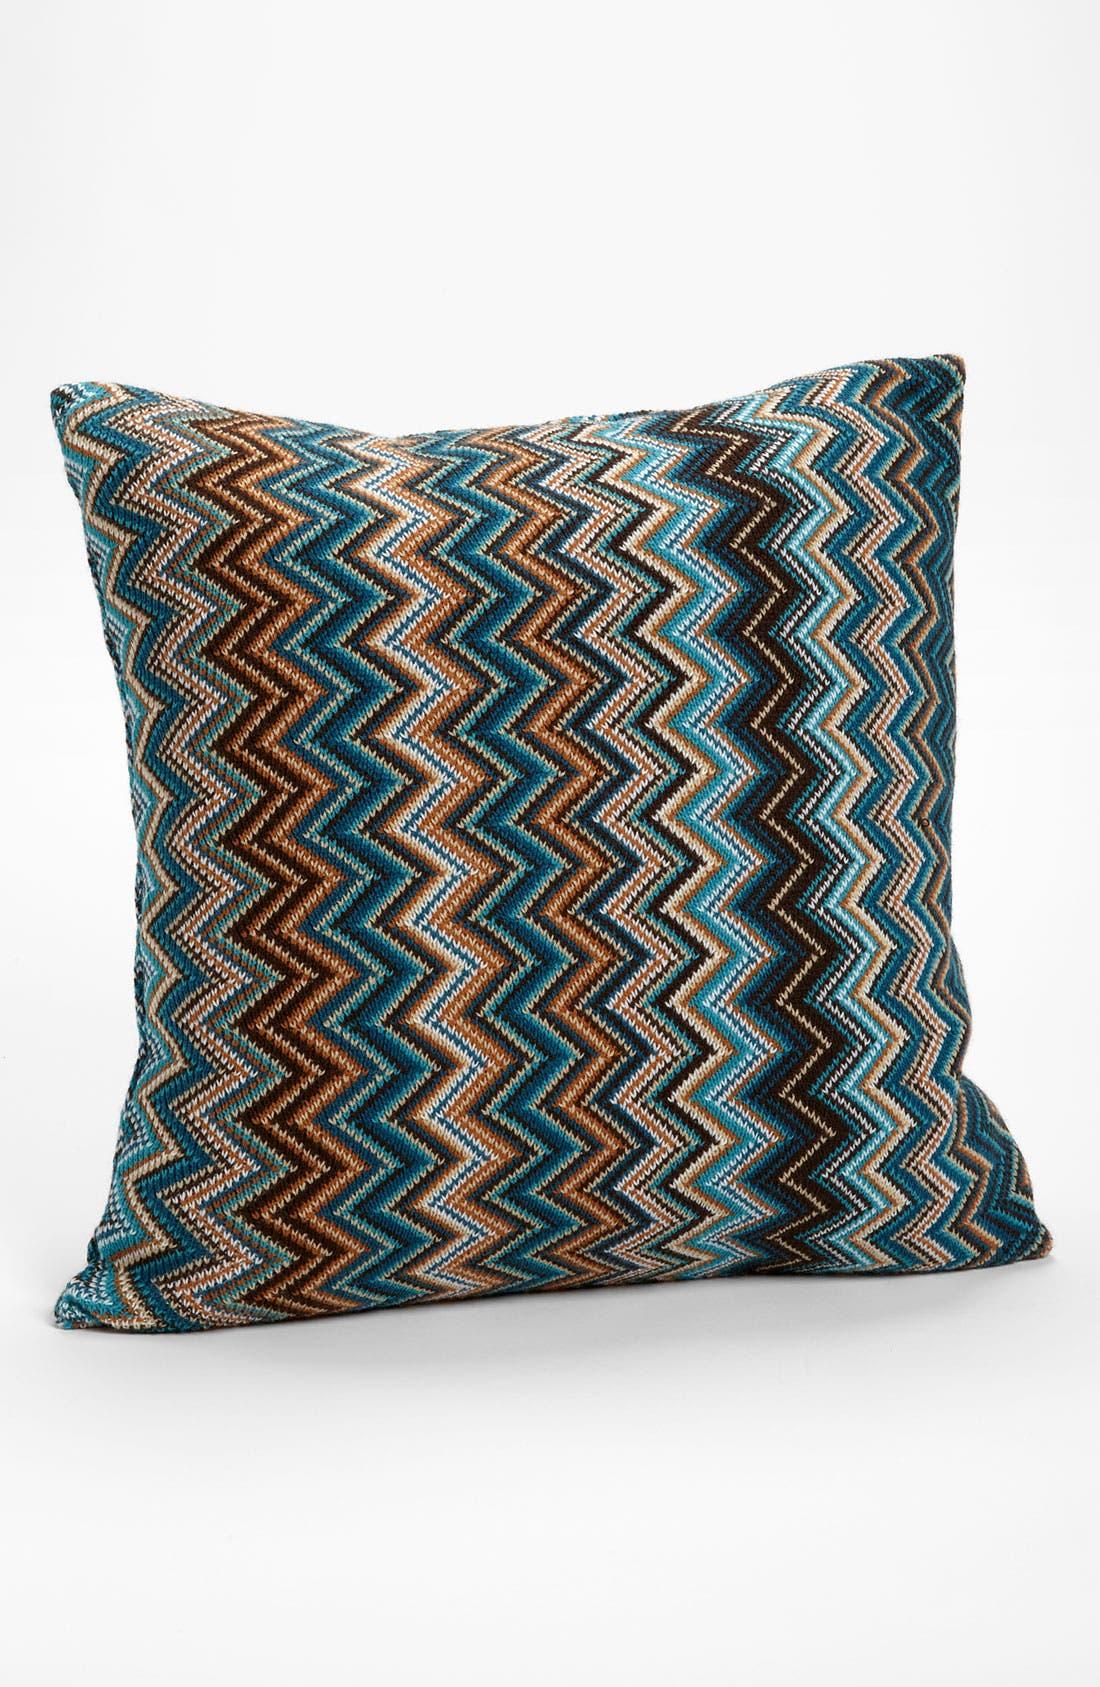 Main Image - Kennebunk Home 'Caitlin' Chevron Knit Pillow